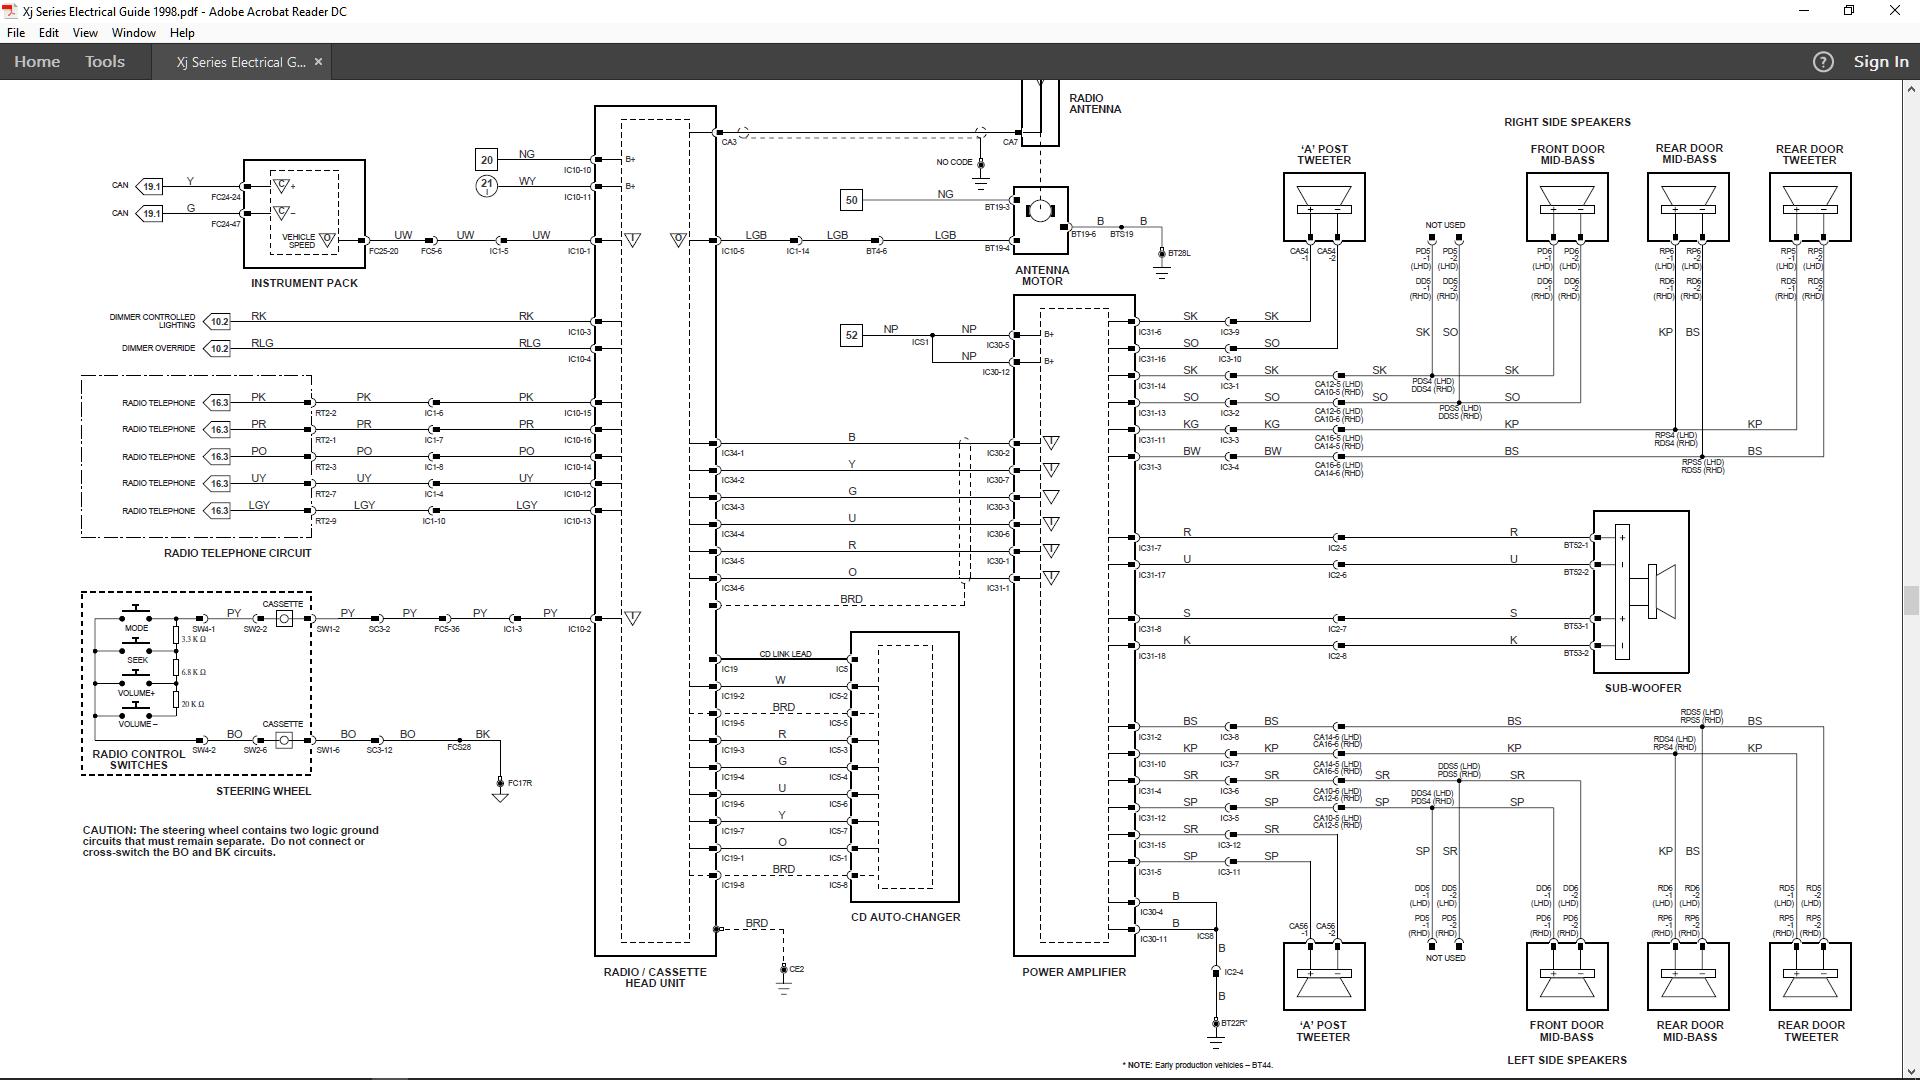 VS_0501] Jaguar Xj8 Stereo Wiring Diagram Free Diagram | 2005 Jaguar Xj Wiring Diagram |  | Capem Unnu Mepta Mohammedshrine Librar Wiring 101